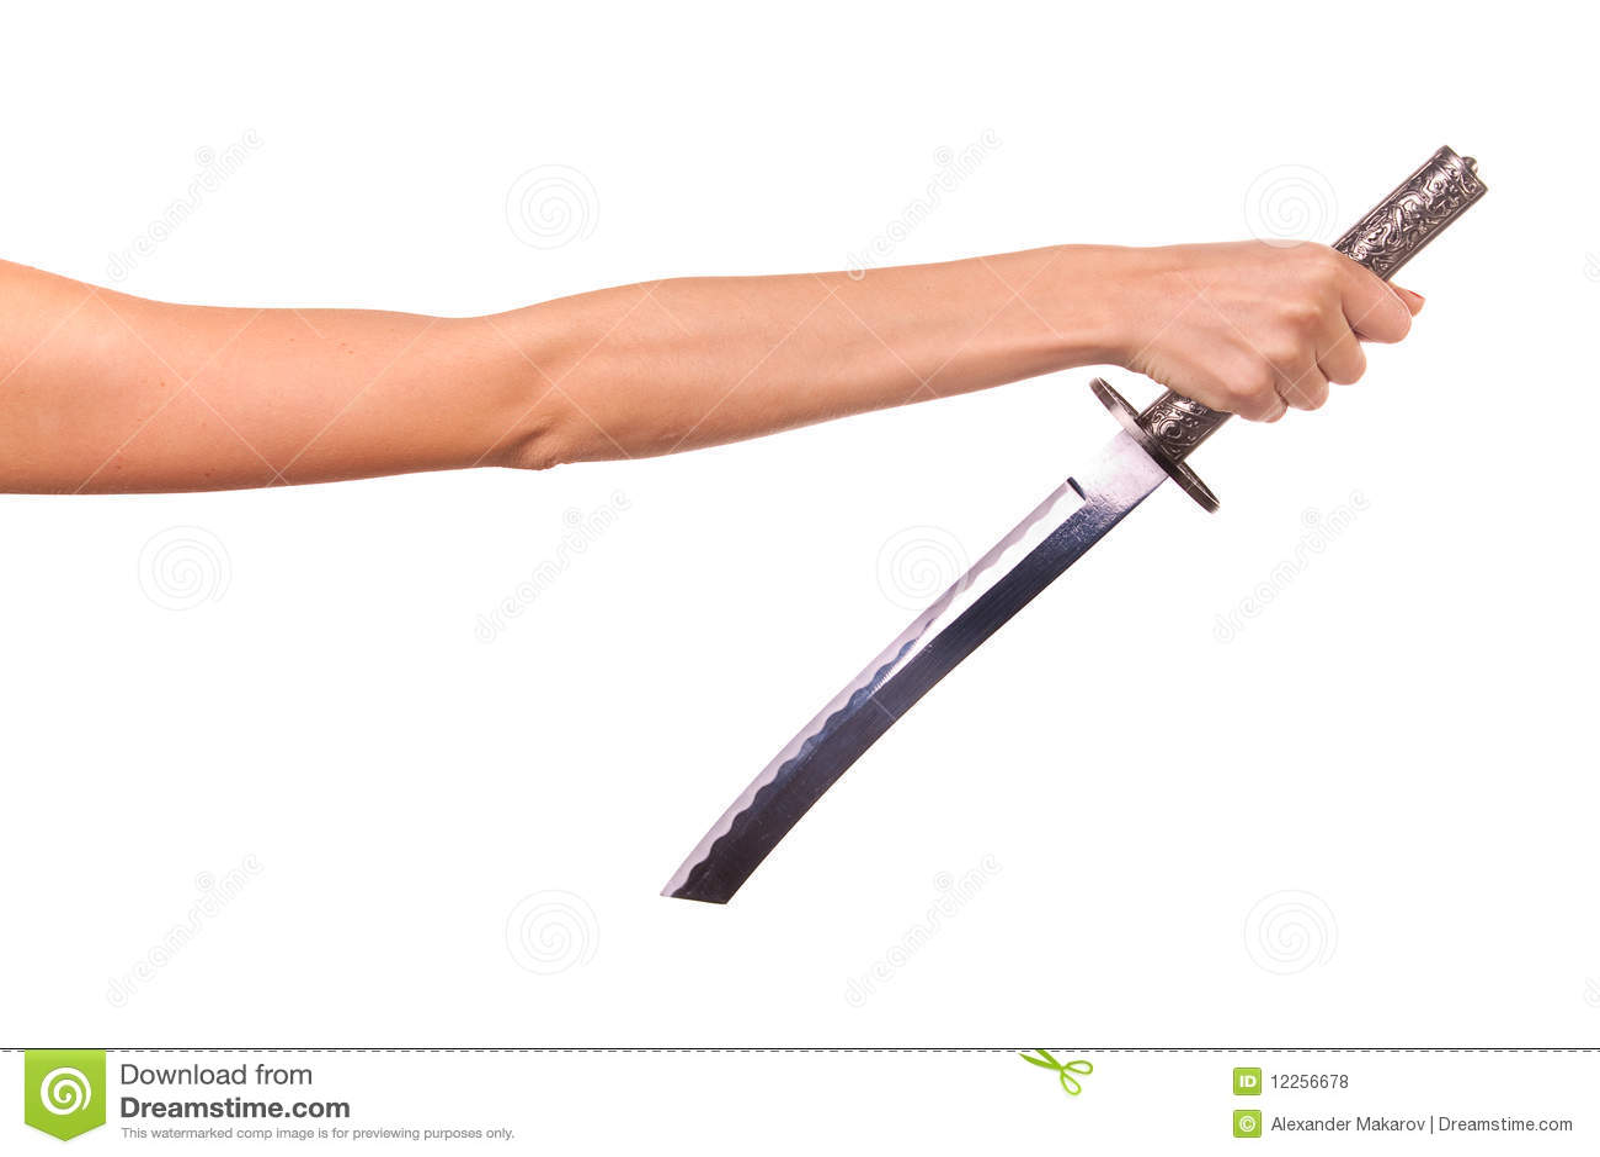 hand holding sword. royalty-free stock photo. download woman hand and sword. holding sword o